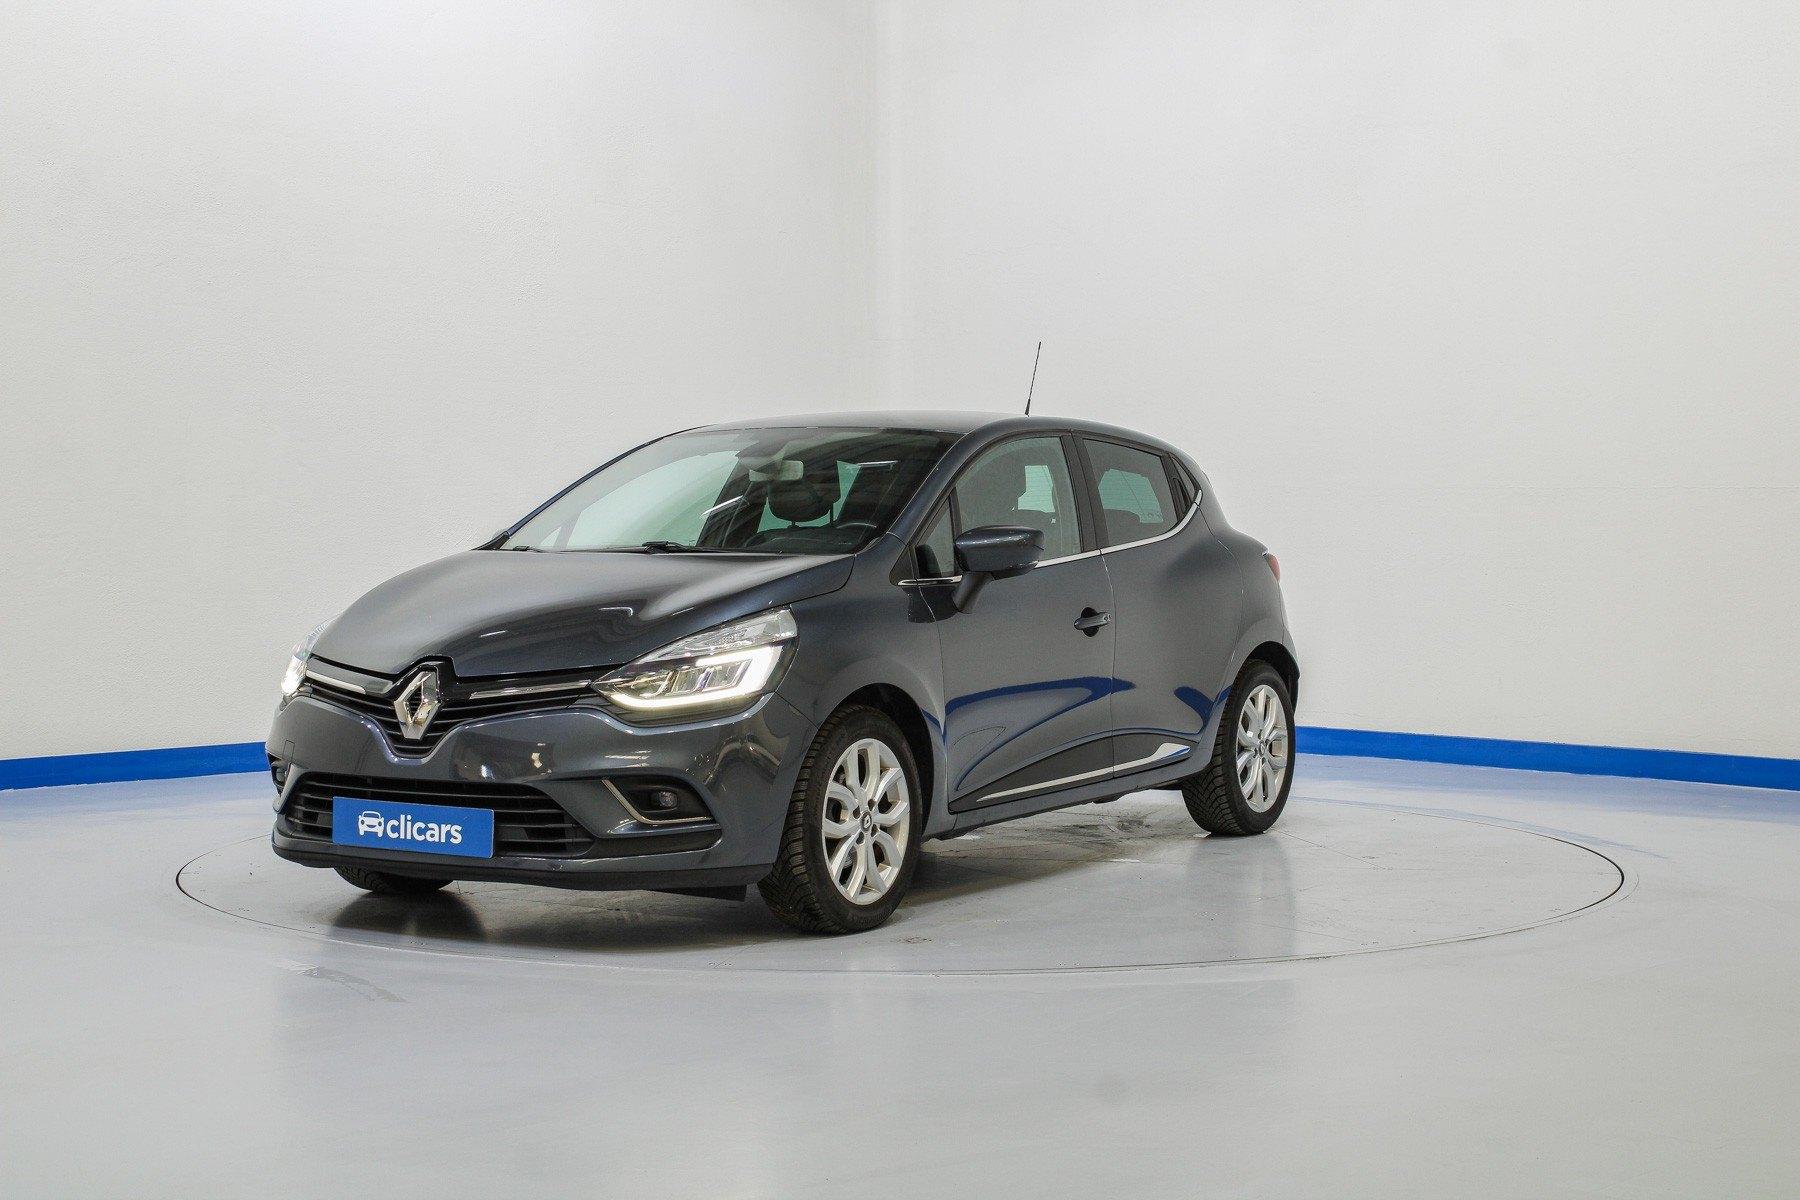 Renault Clio Gasolina Zen Energy TCe 66kW (90CV) 1